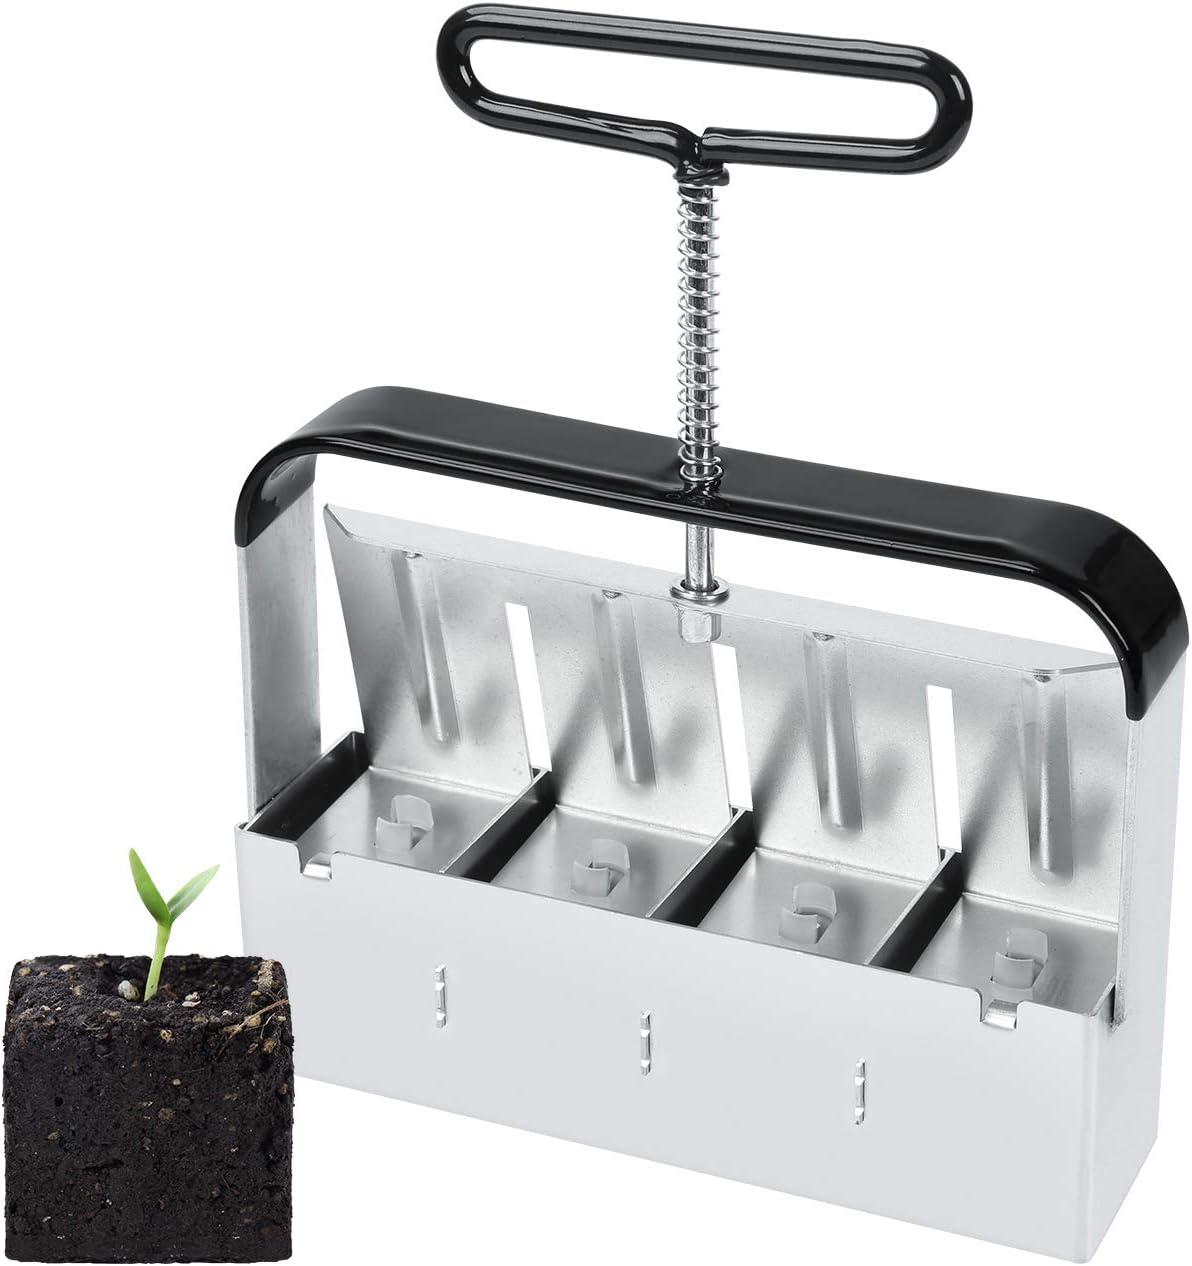 SOLIGT Manual Quad Soil Blocker with Comfort-Grip Handle, Create 2